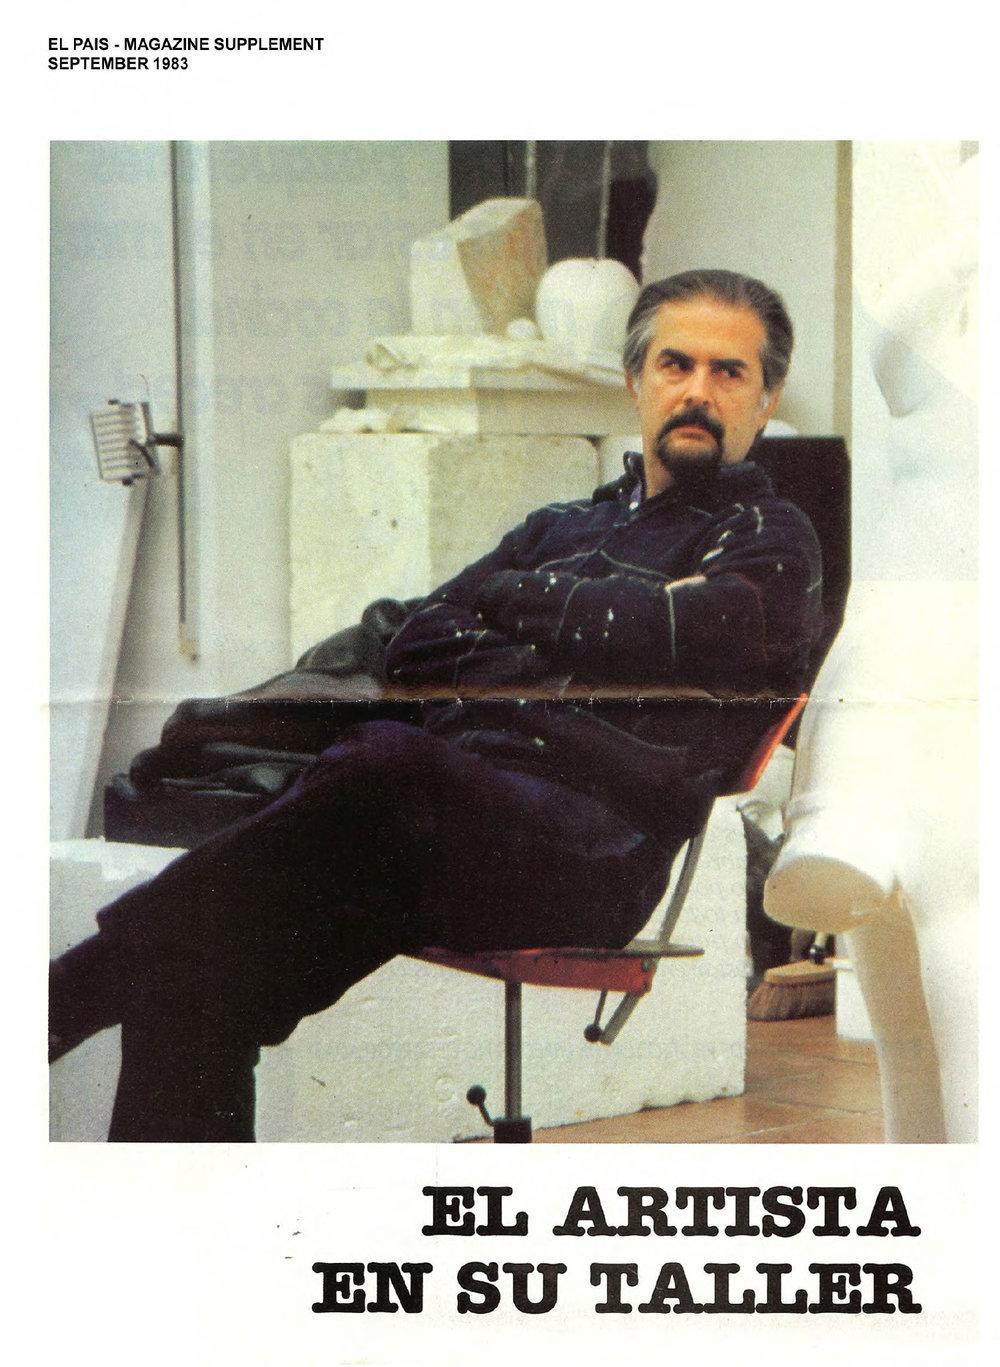 El Pais Magazine, 1983